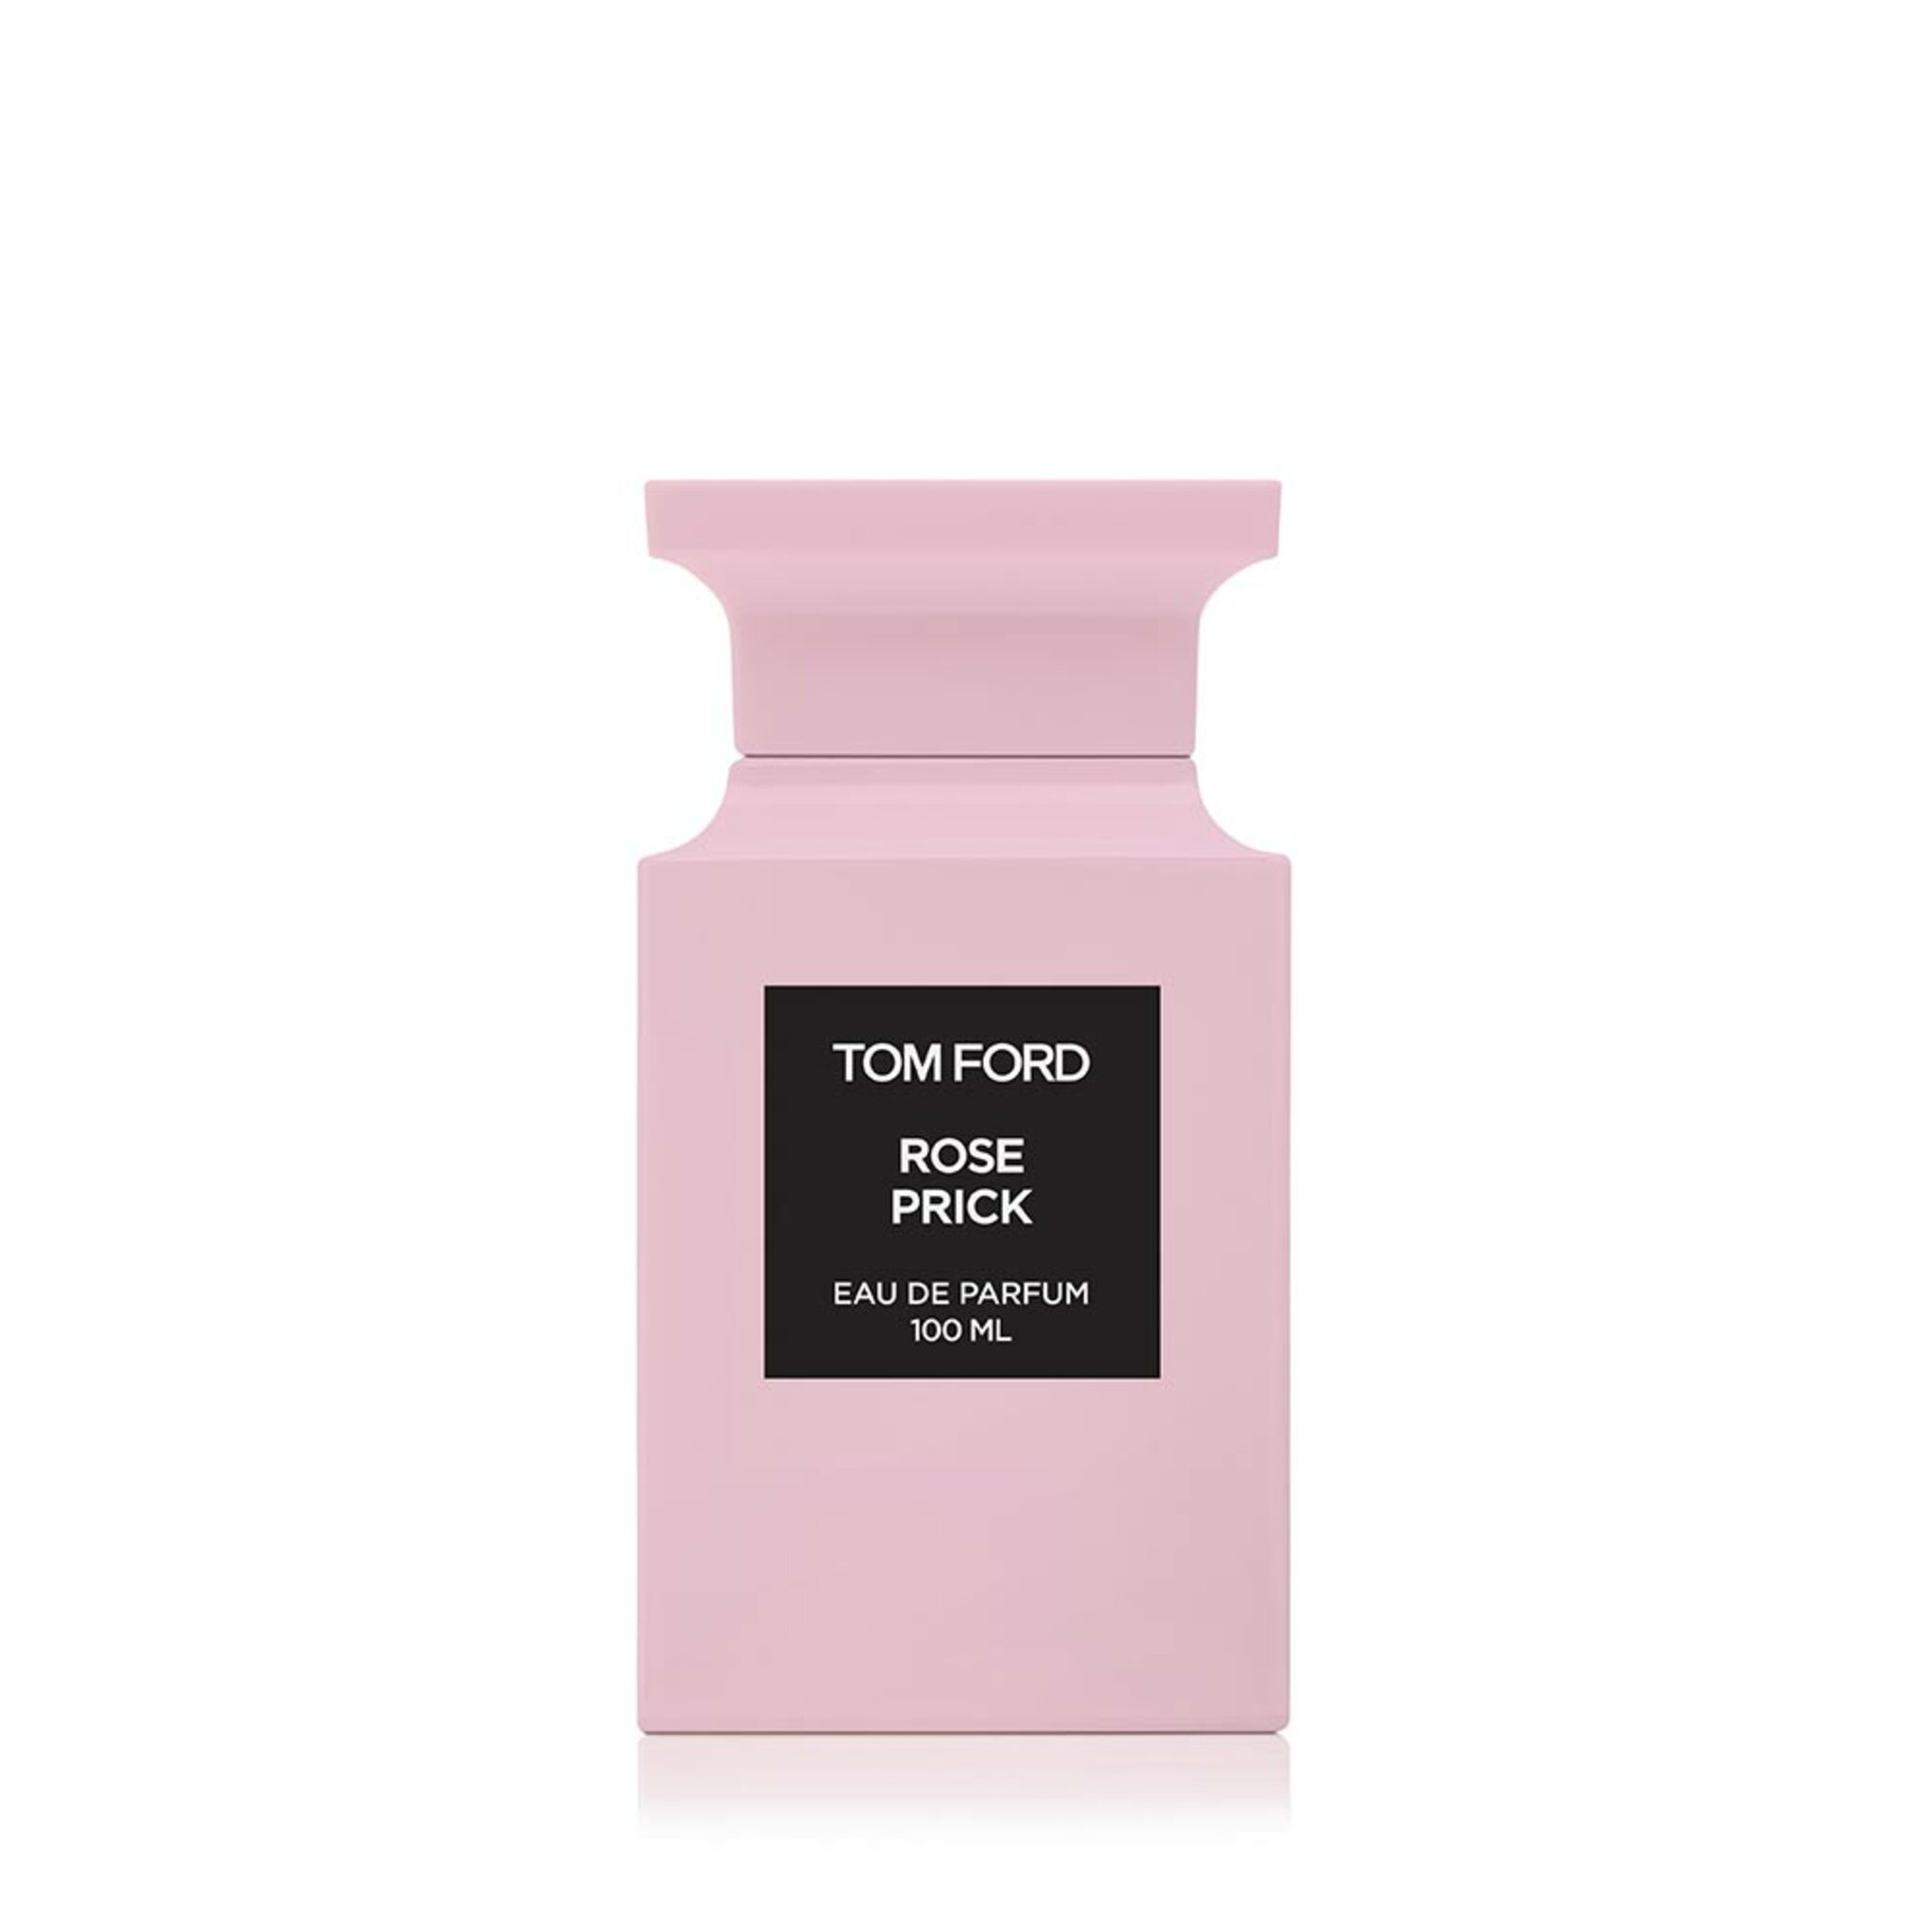 Rose Prick EDP, 100 ML